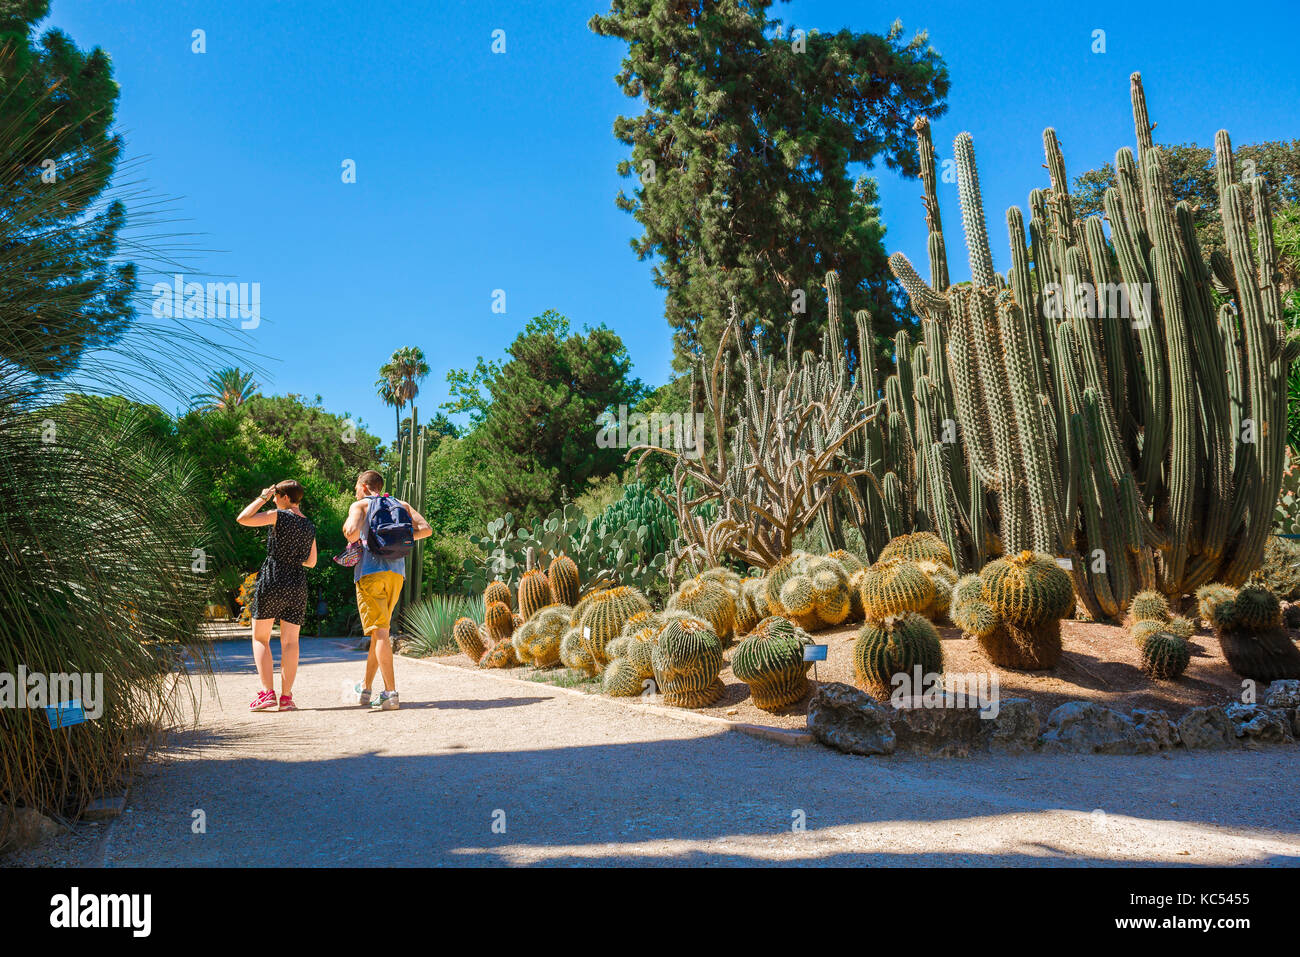 Valencia Spain Botanical Garden, A Young Couple Visiting The Jardin  Botanico Walk Past A Section Of The Desert Plants Area, Valencia.